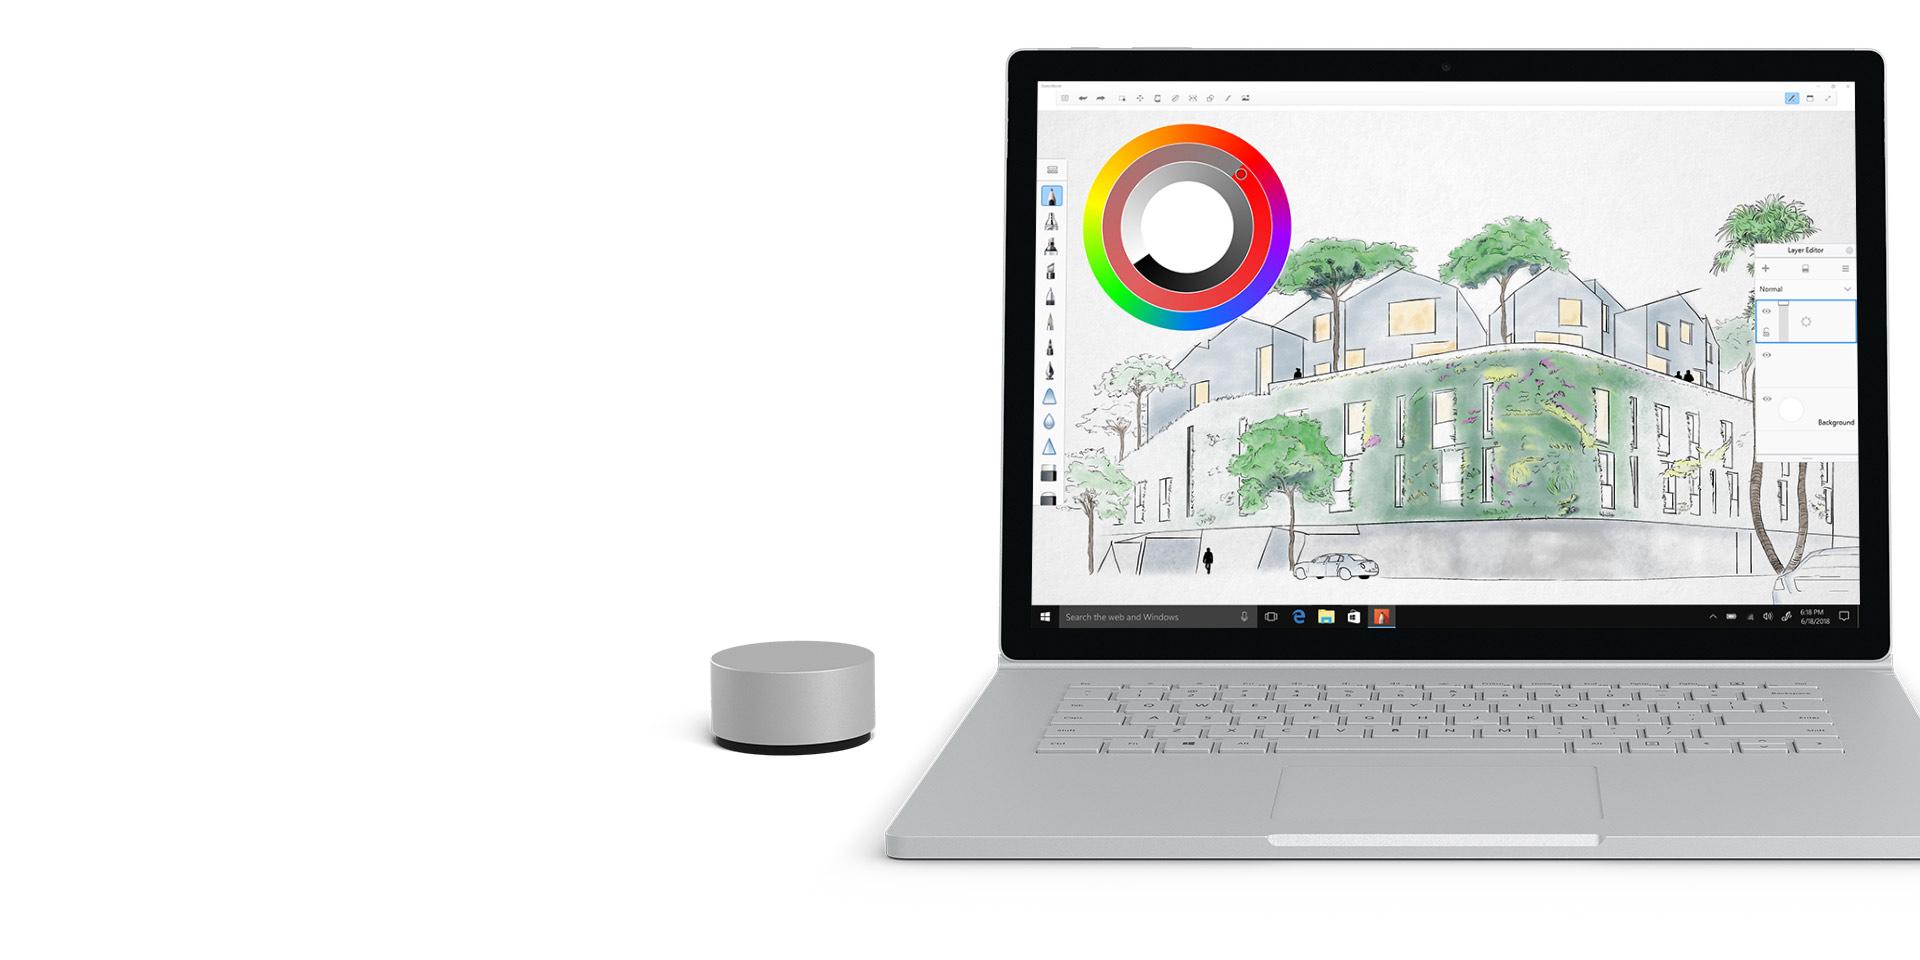 Surface Book 2-Display mit geöffnetem Autodesk SketchBook